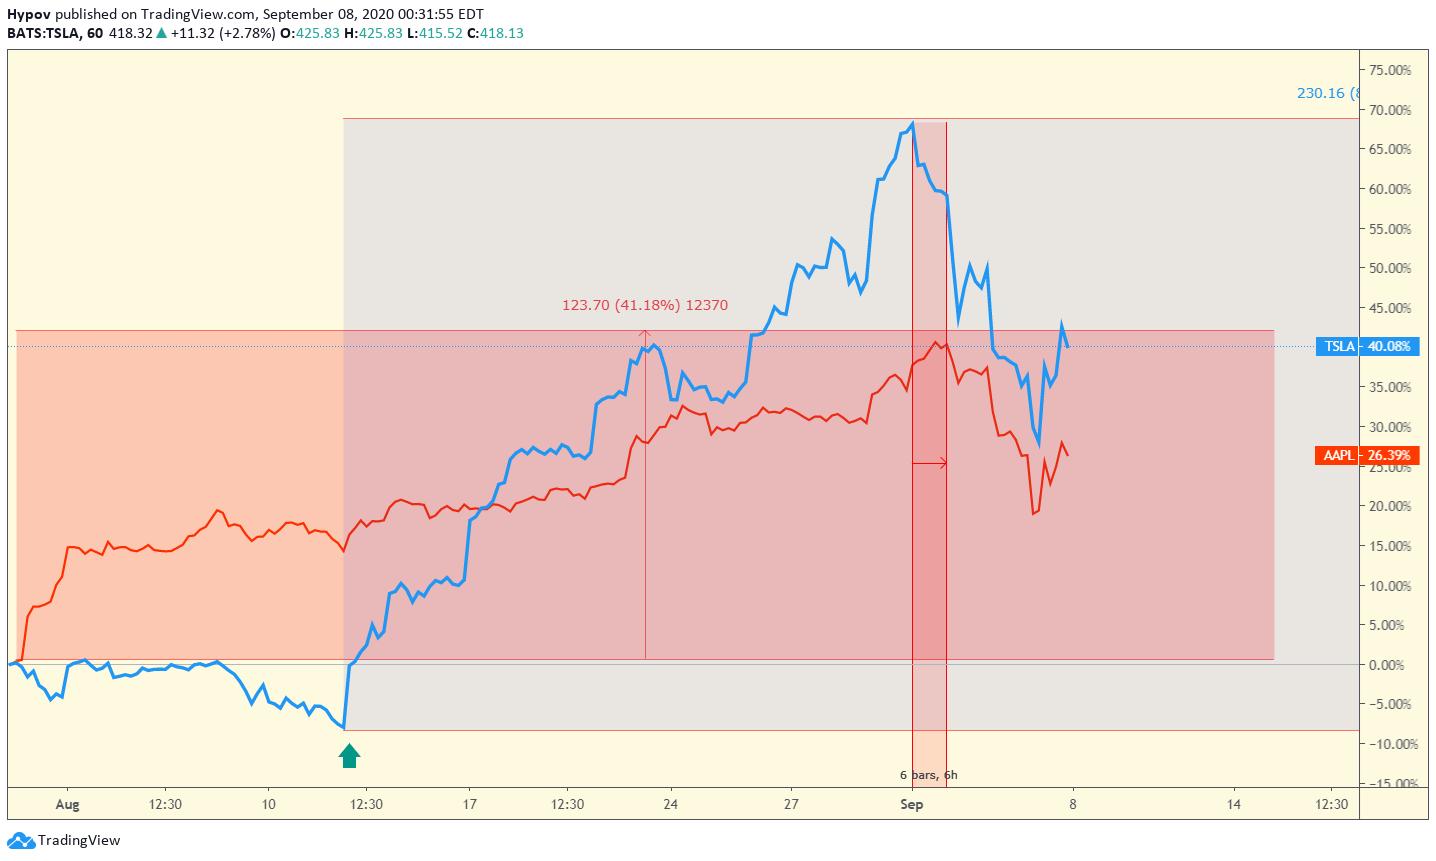 LiteForex: Tesla forecast: Fundamental and technical analysis